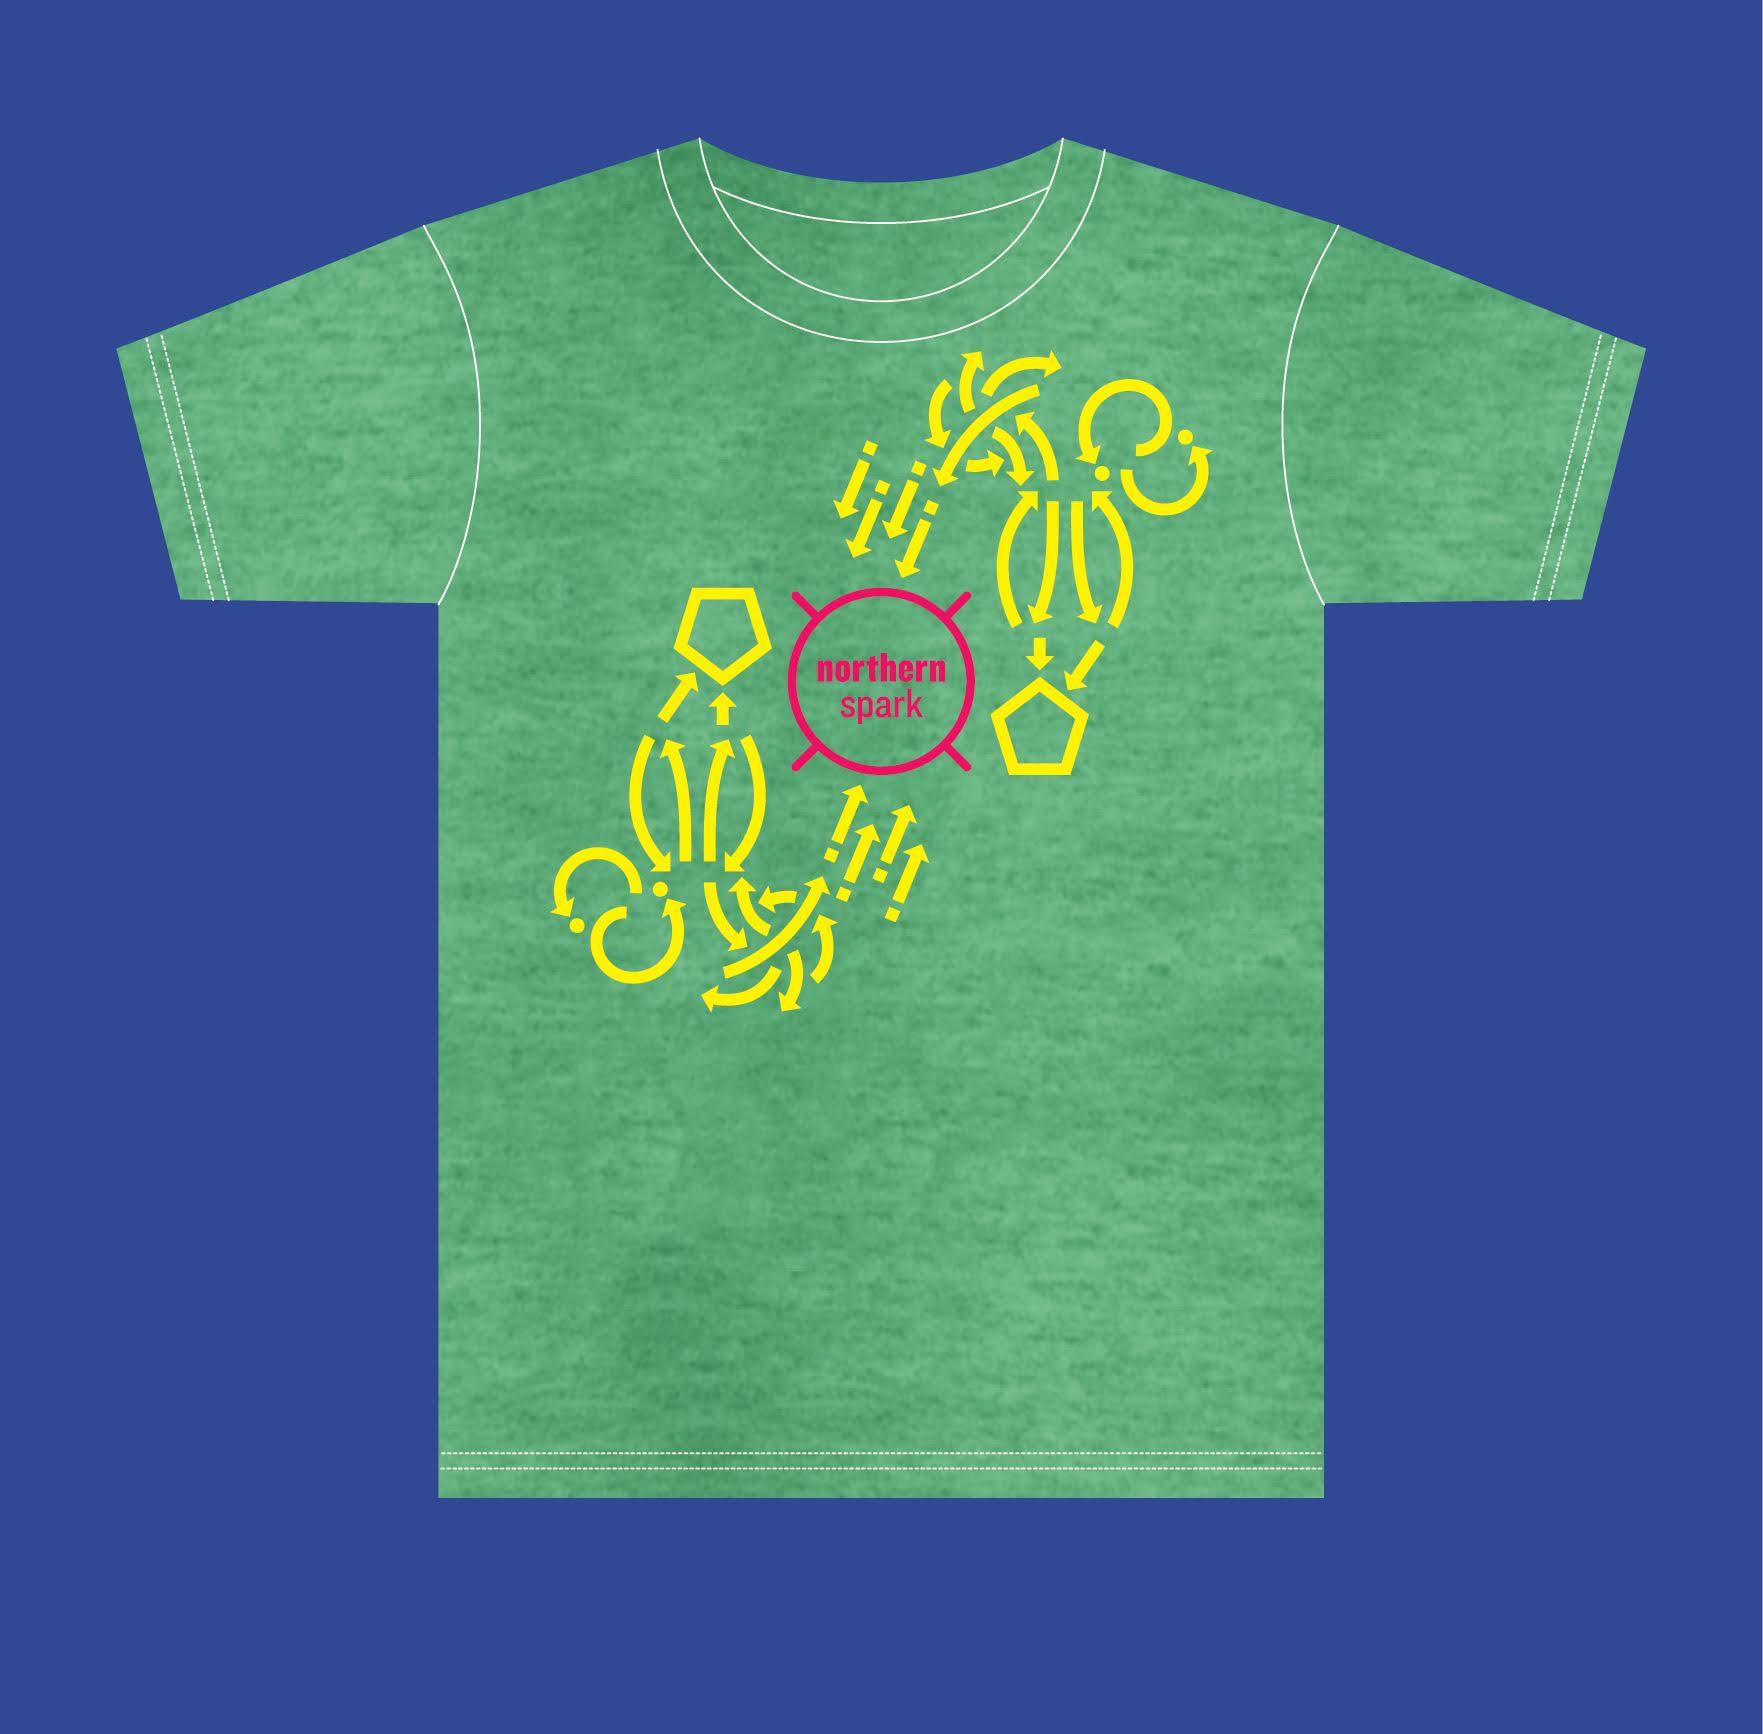 NSPK2016 shirt